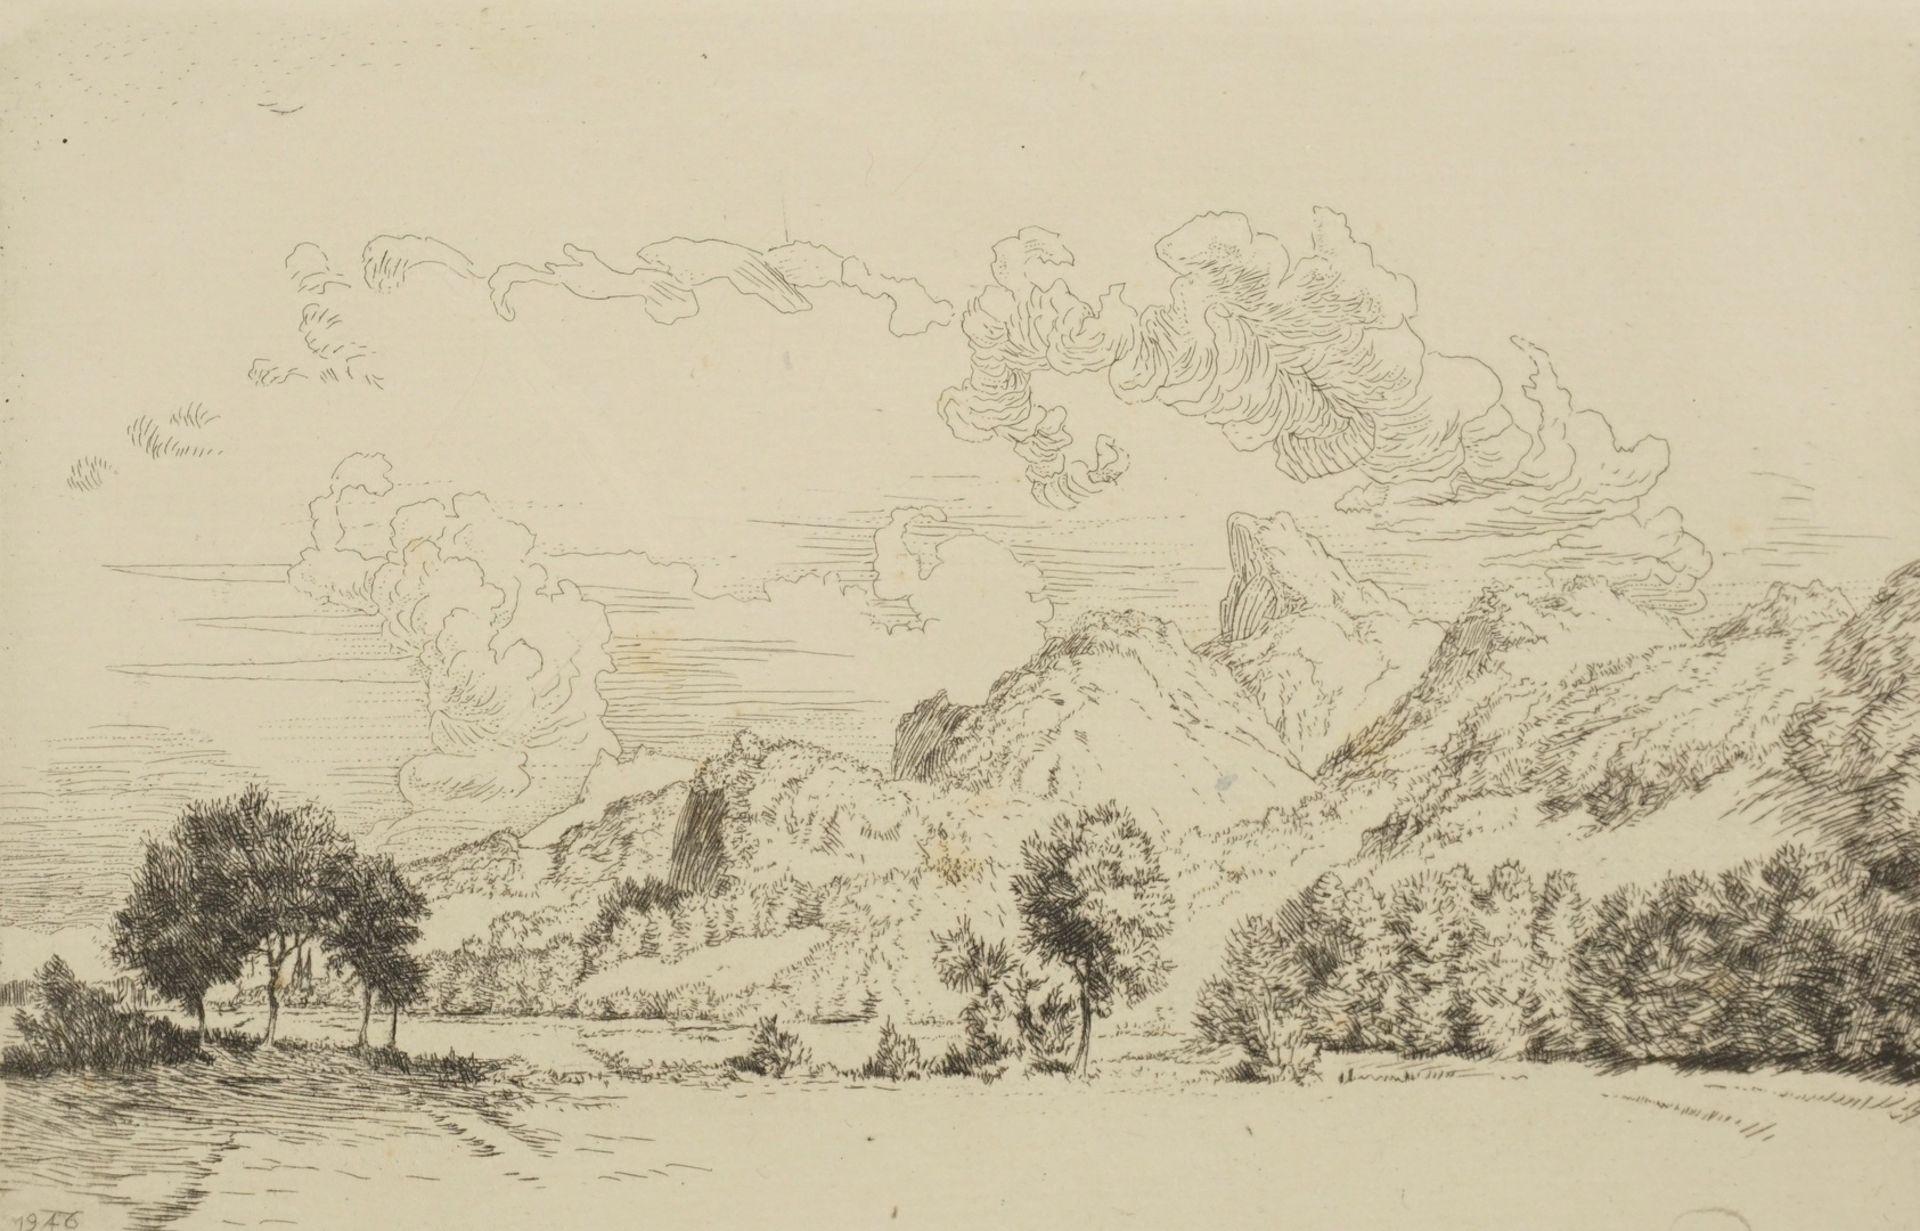 Harald Pickert, Gebirgige Landschaft mit Kirche